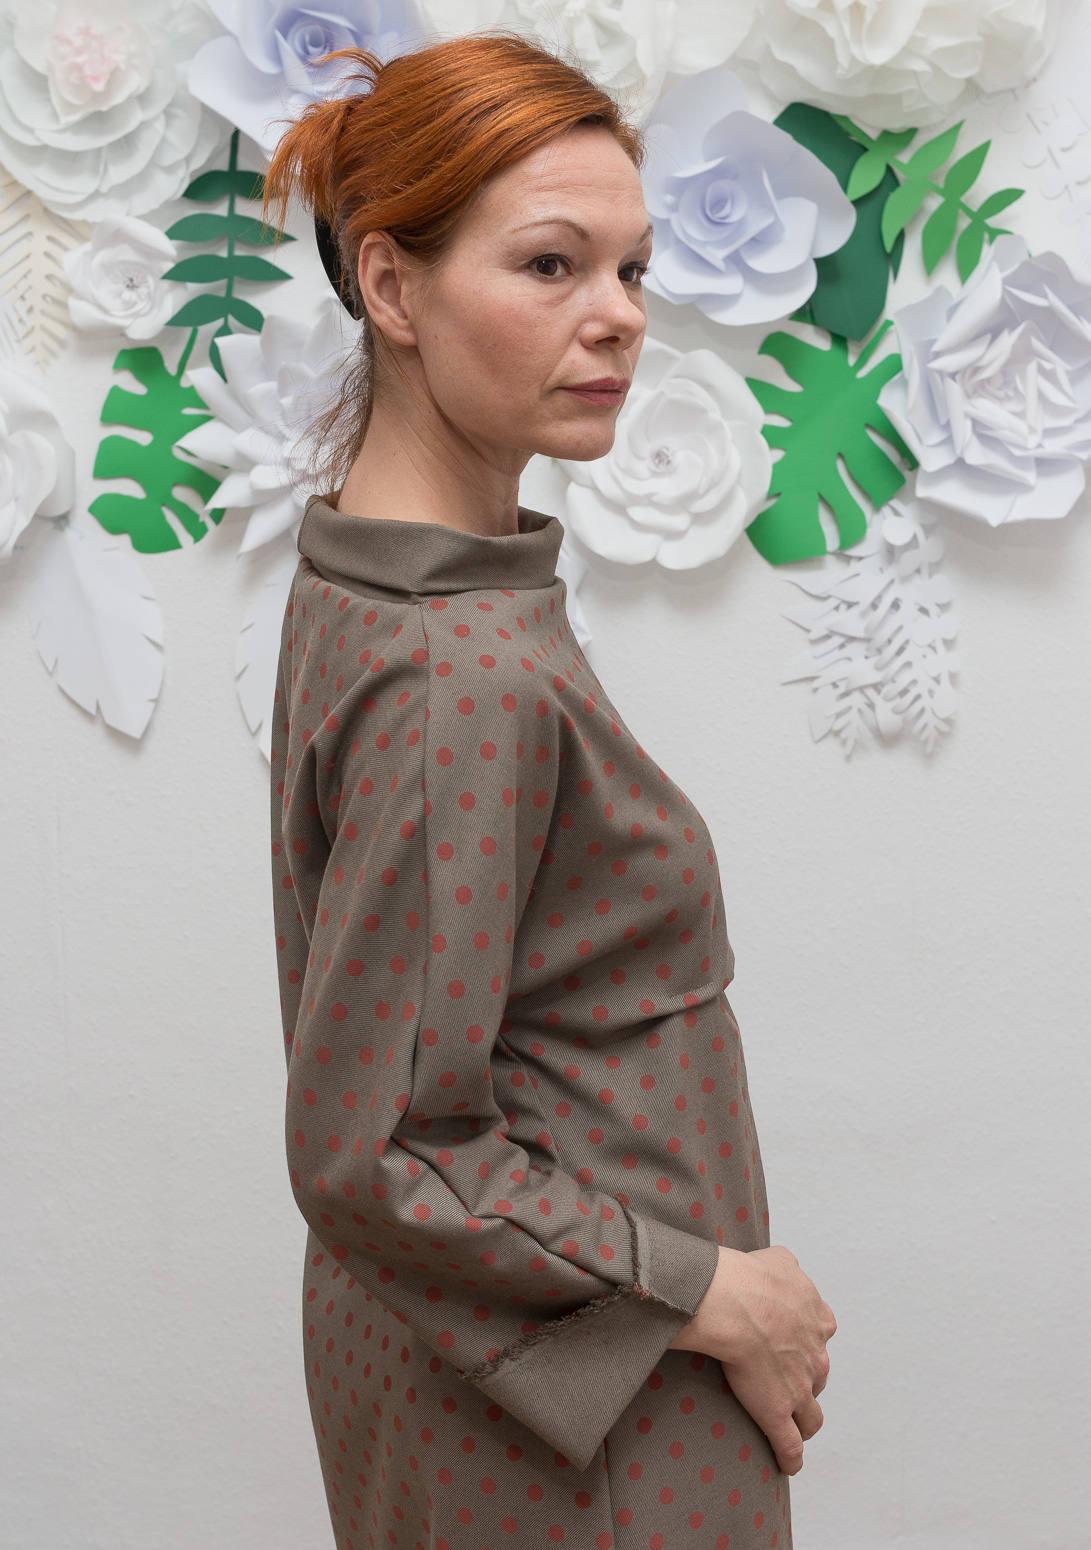 ROTETULPE Winterkleid Kimono Kleid 2